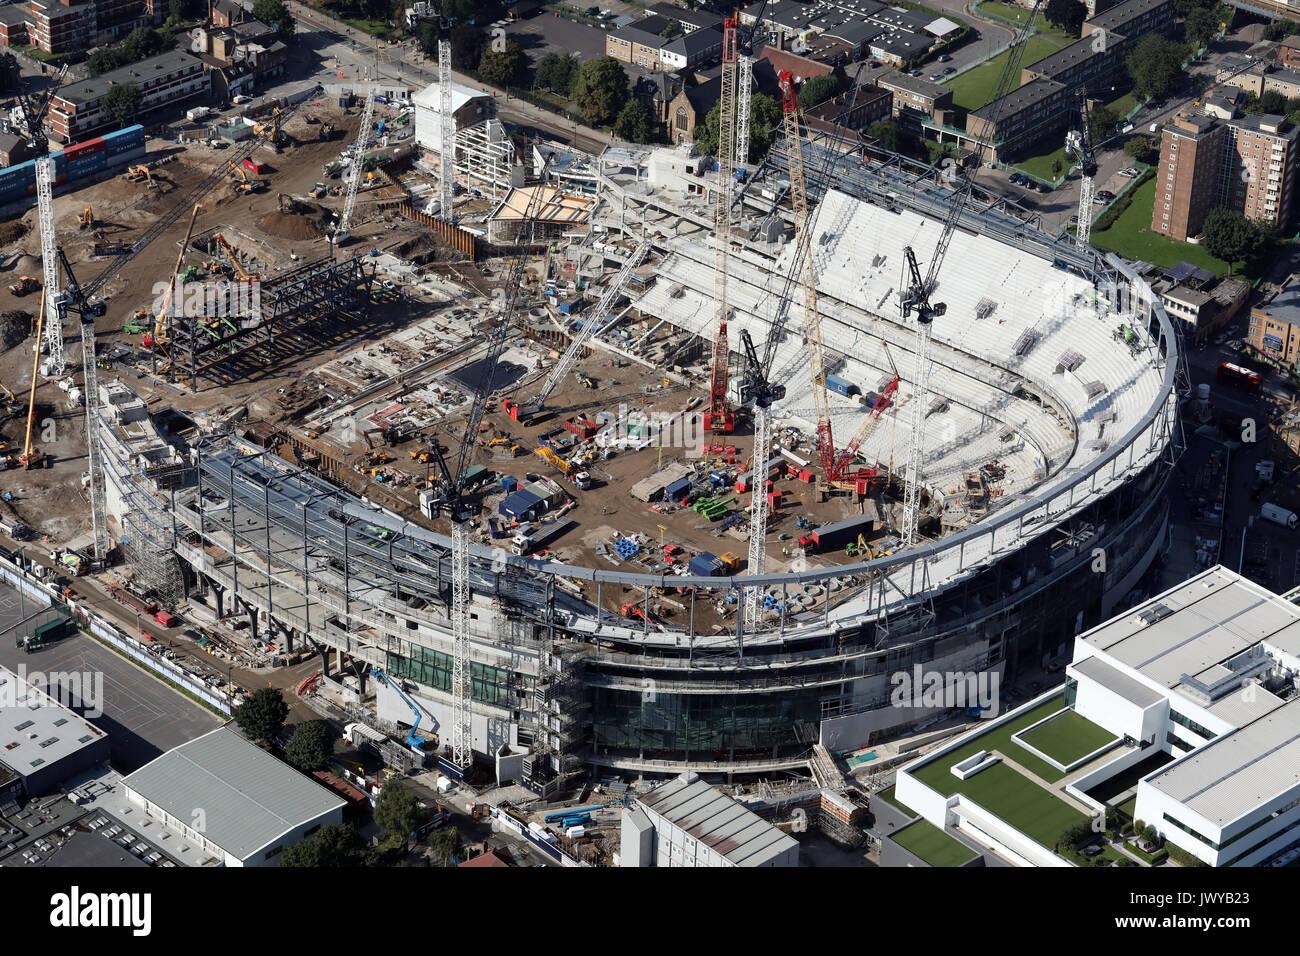 aerial view of Tottenham Hotspur White Hart Lane new stadium under construction, London, UK - Stock Image